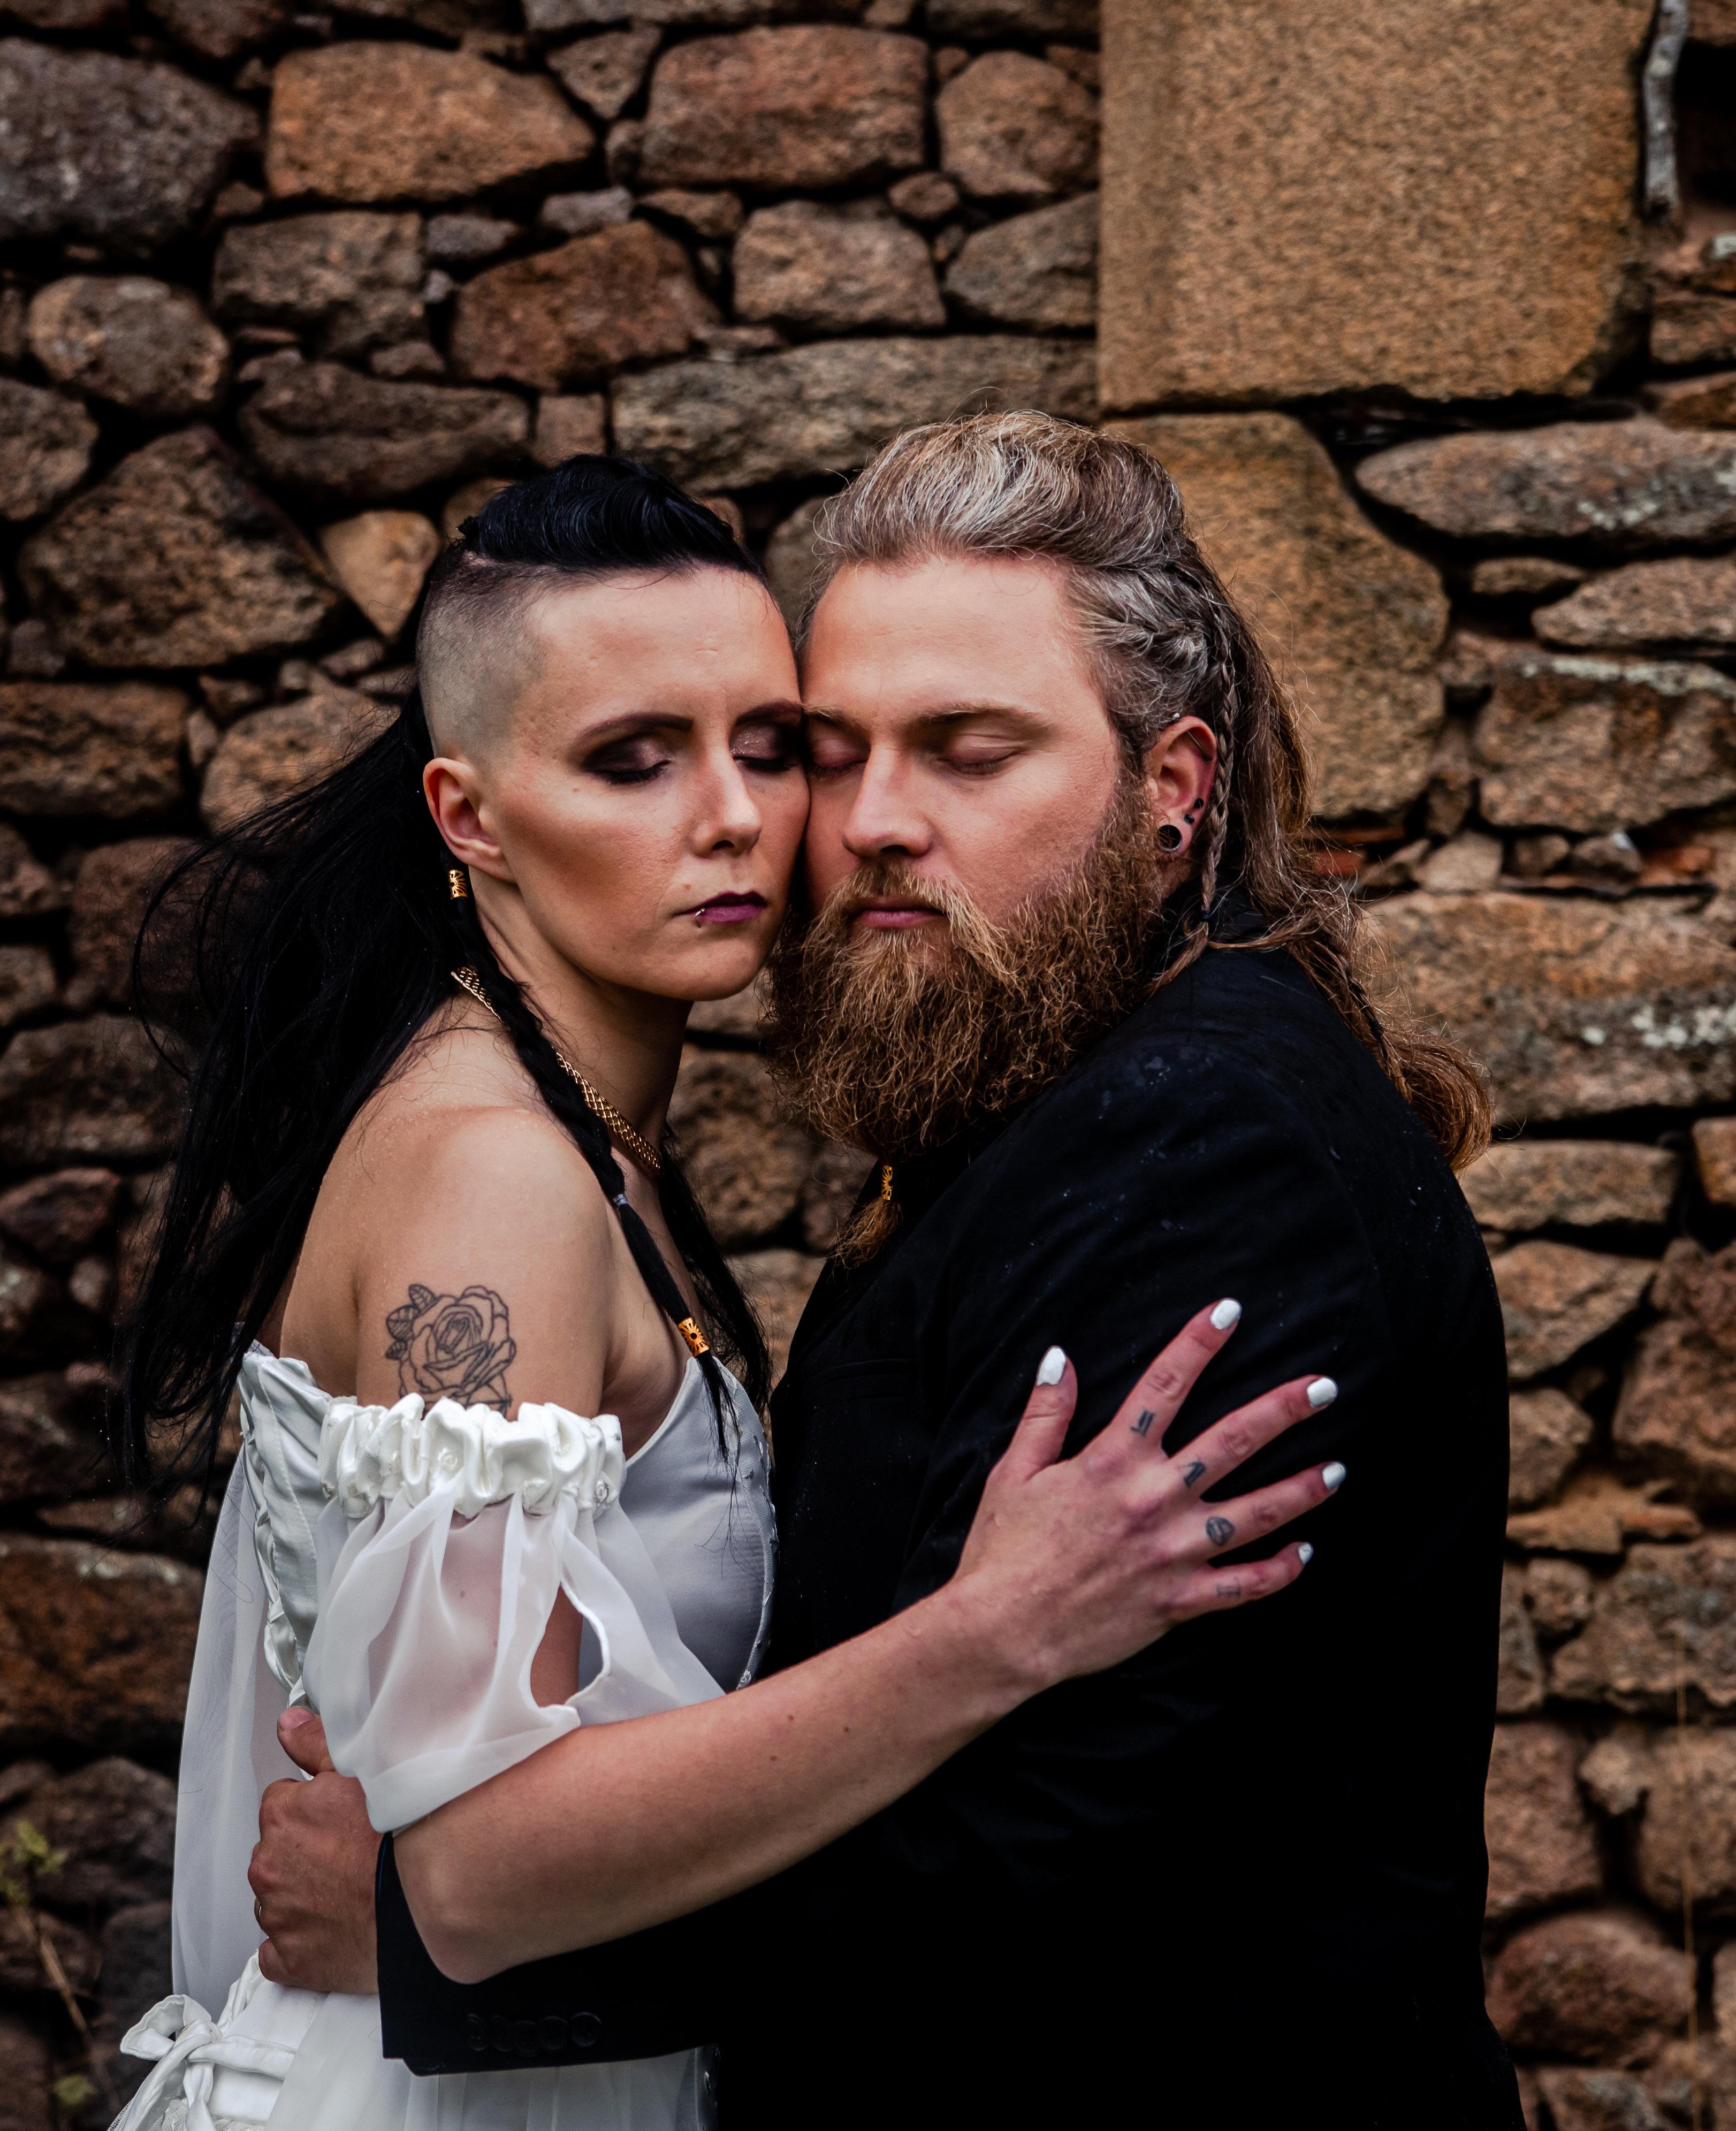 Mariage Viking - Mademoiselle Clic